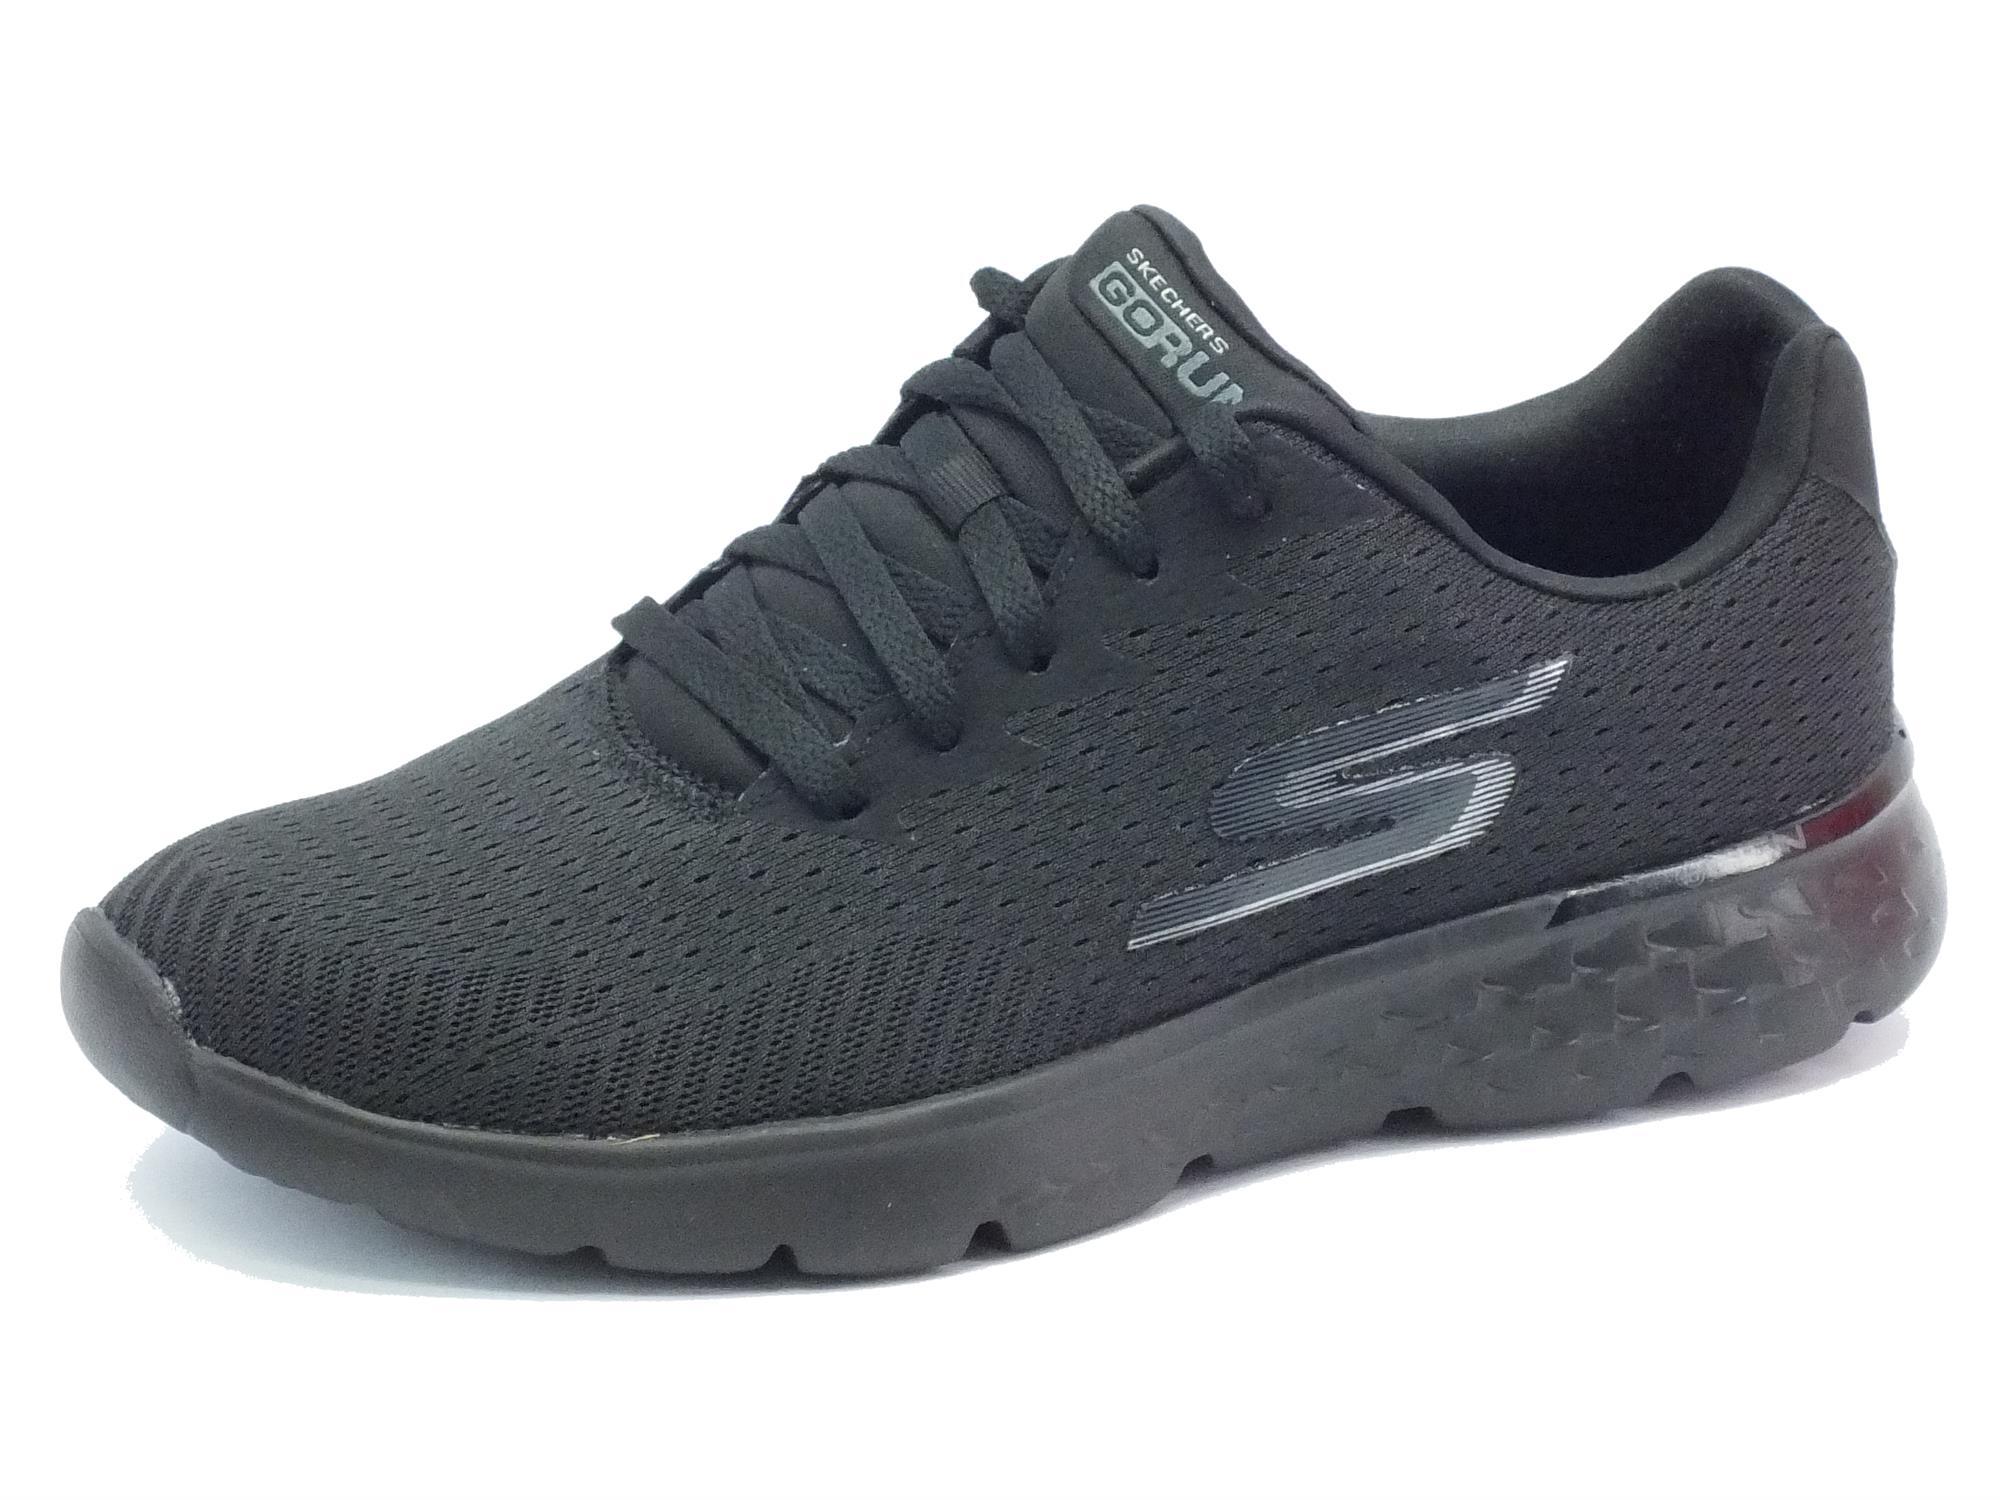 Acquista scarpe running skechers OFF30% sconti